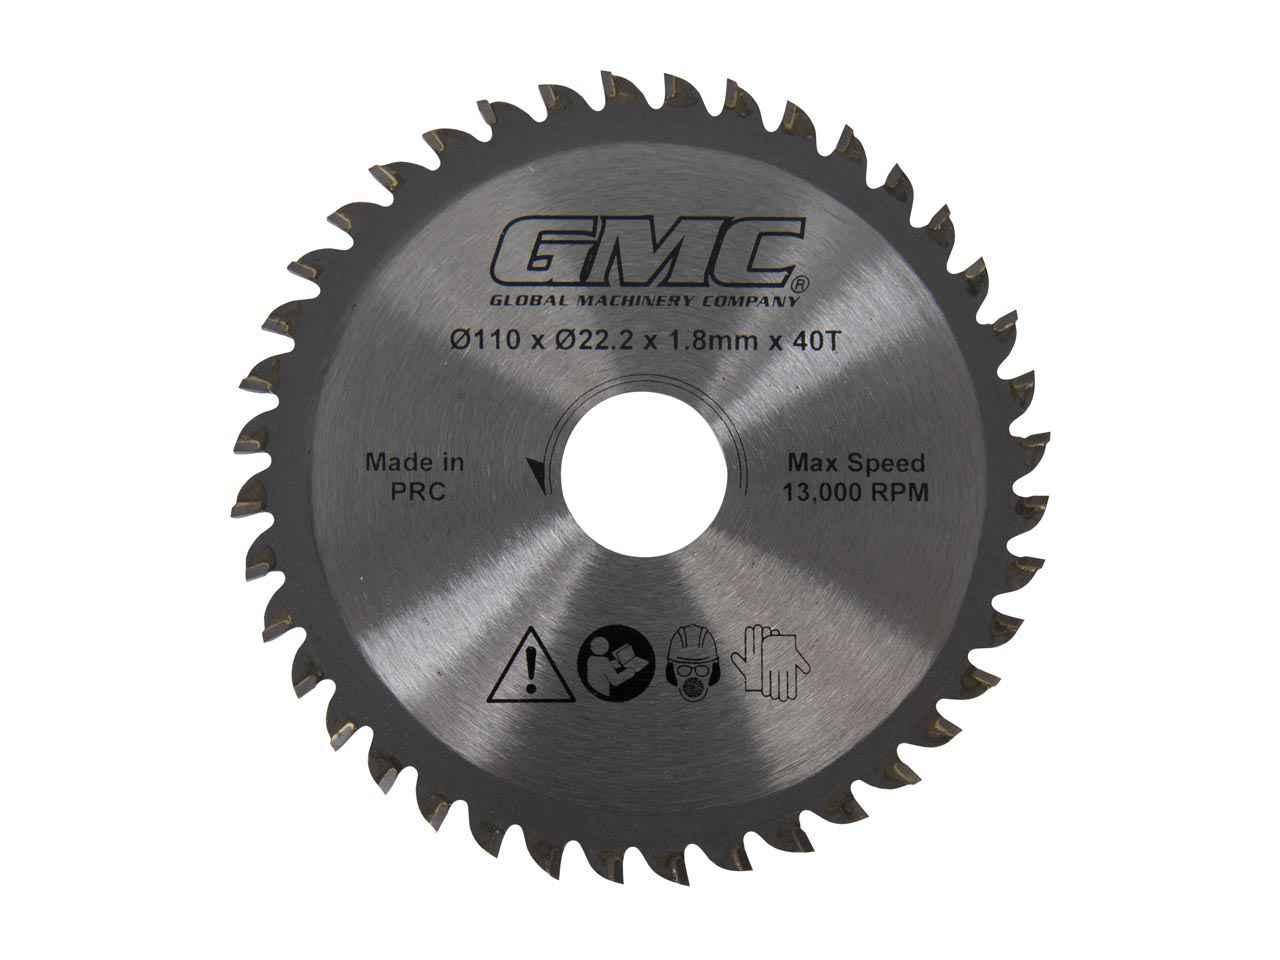 # GMC Tungsten Carbide Tipped Saw Blade GTS1500 110 x 22.2 x 40T 936962 586371